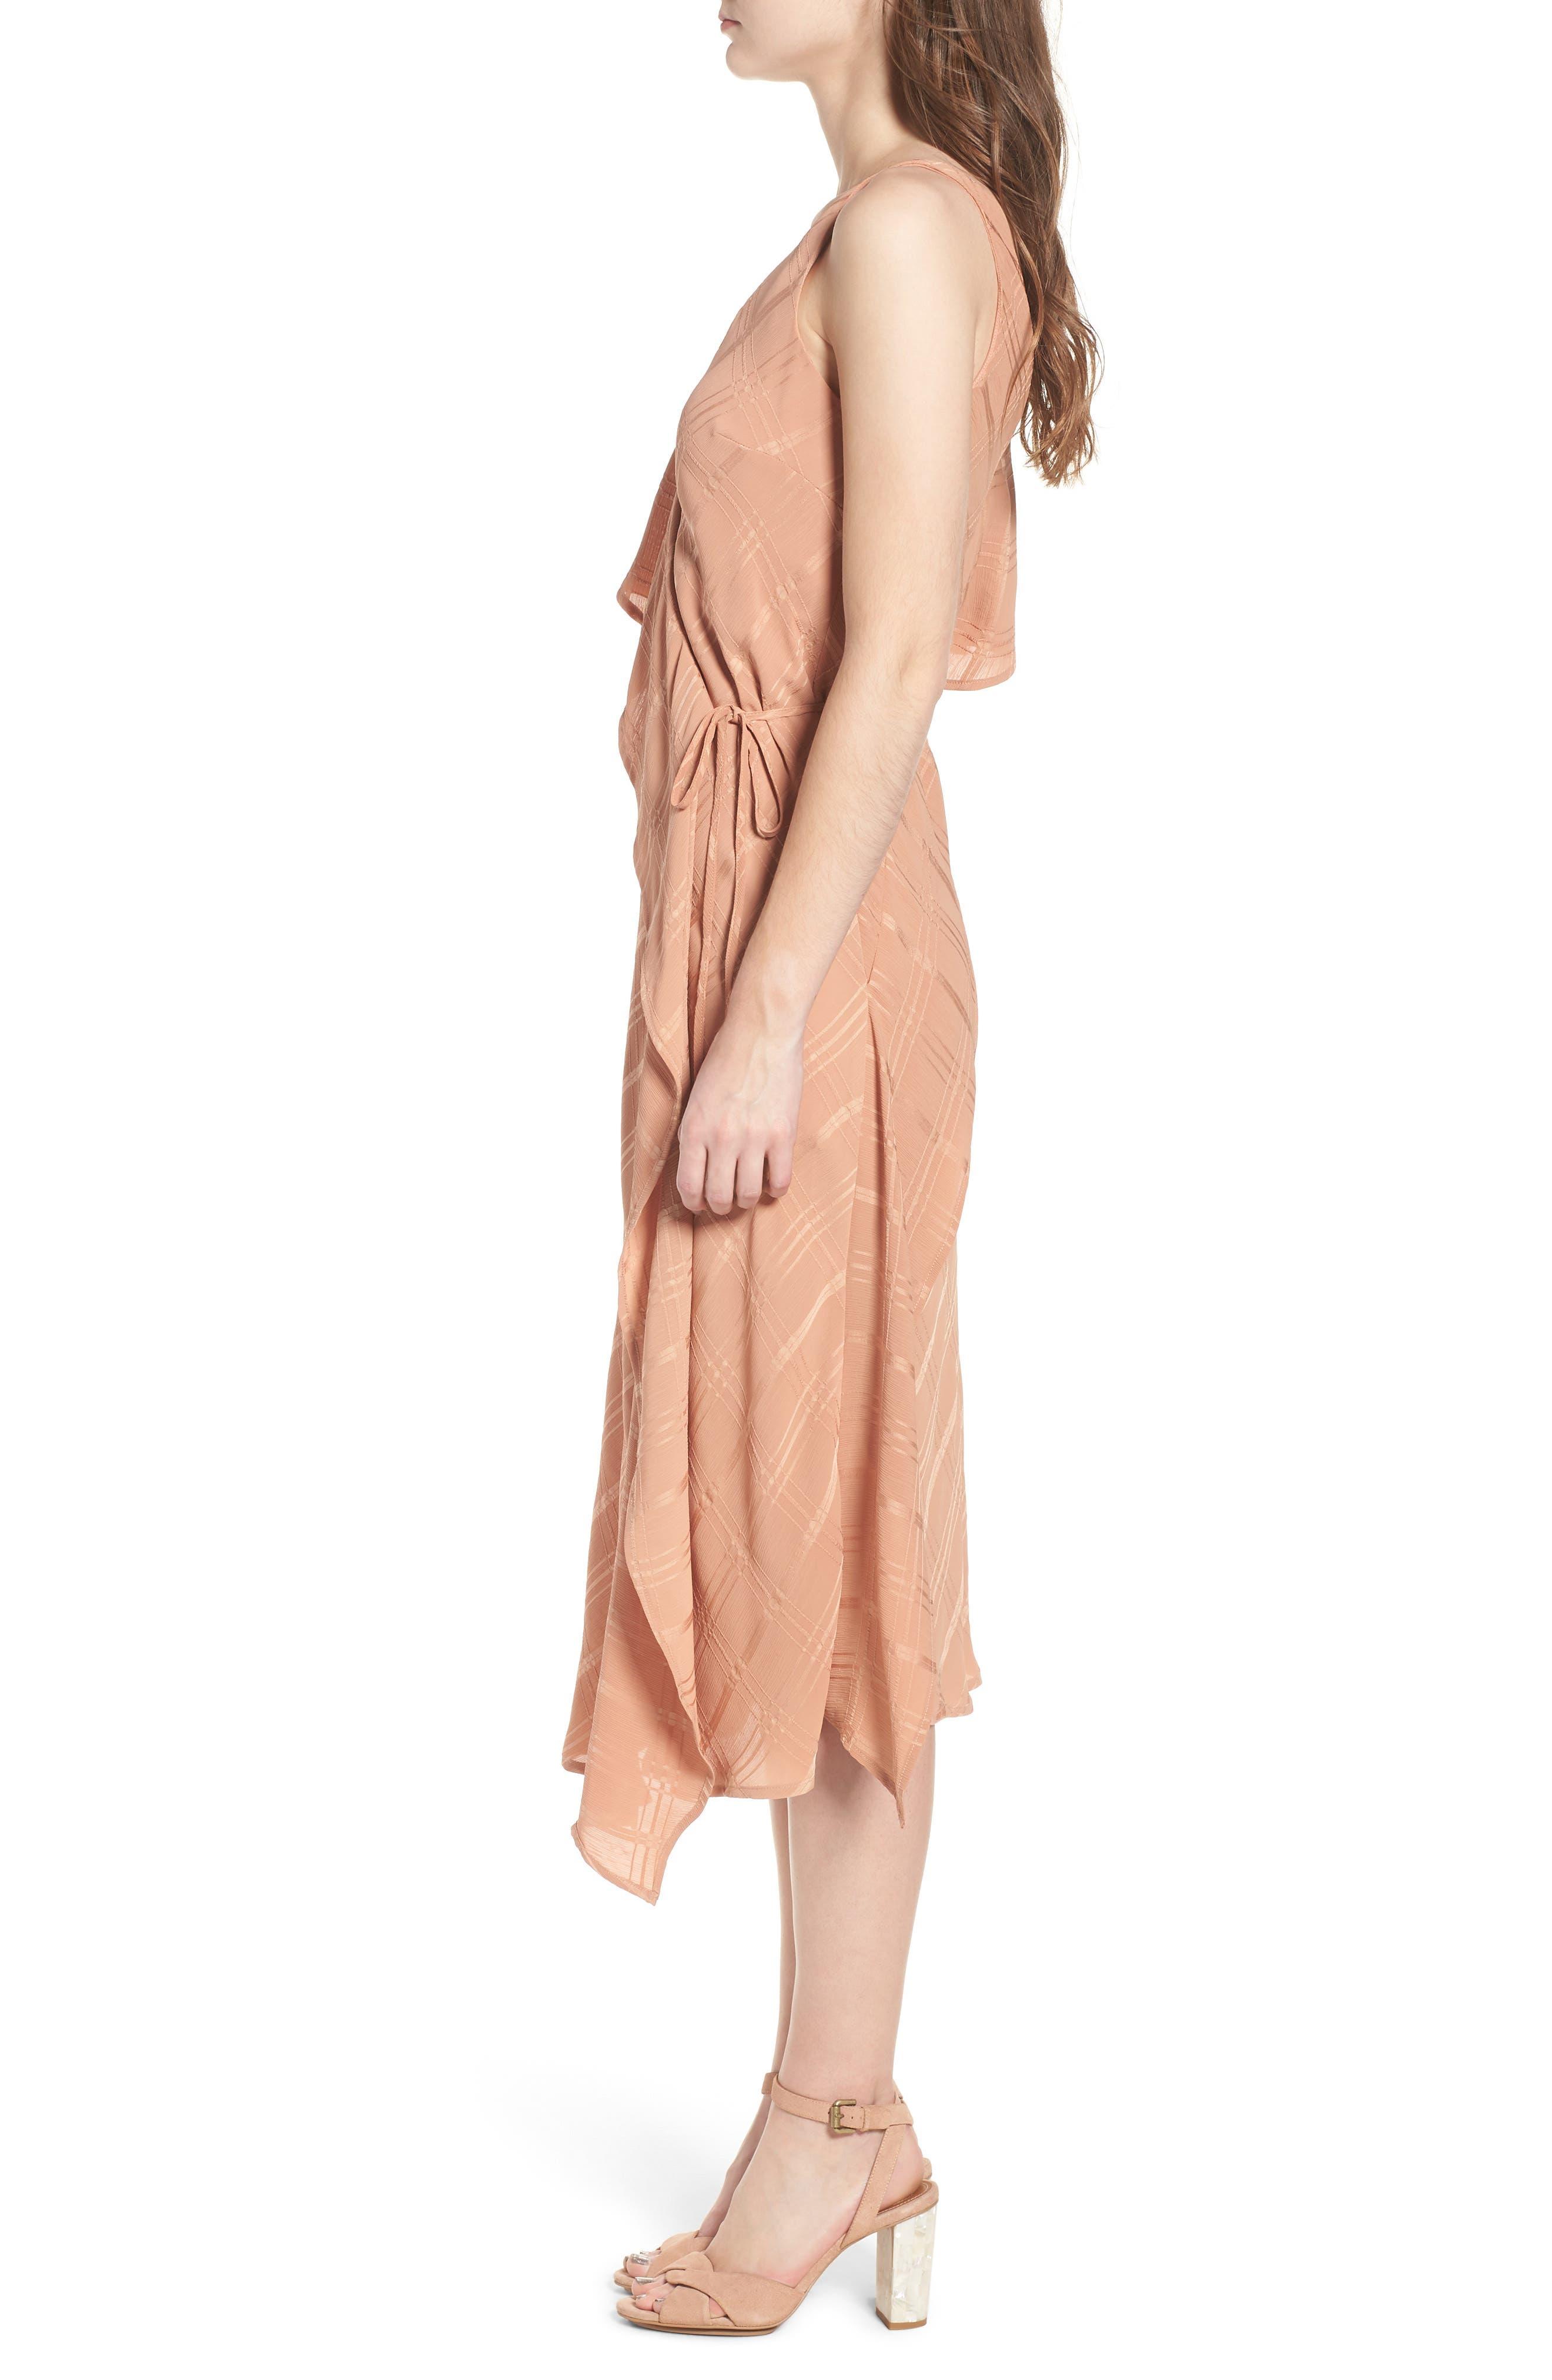 Yoanna Ruffle Trim Wrap Dress,                             Alternate thumbnail 3, color,                             250